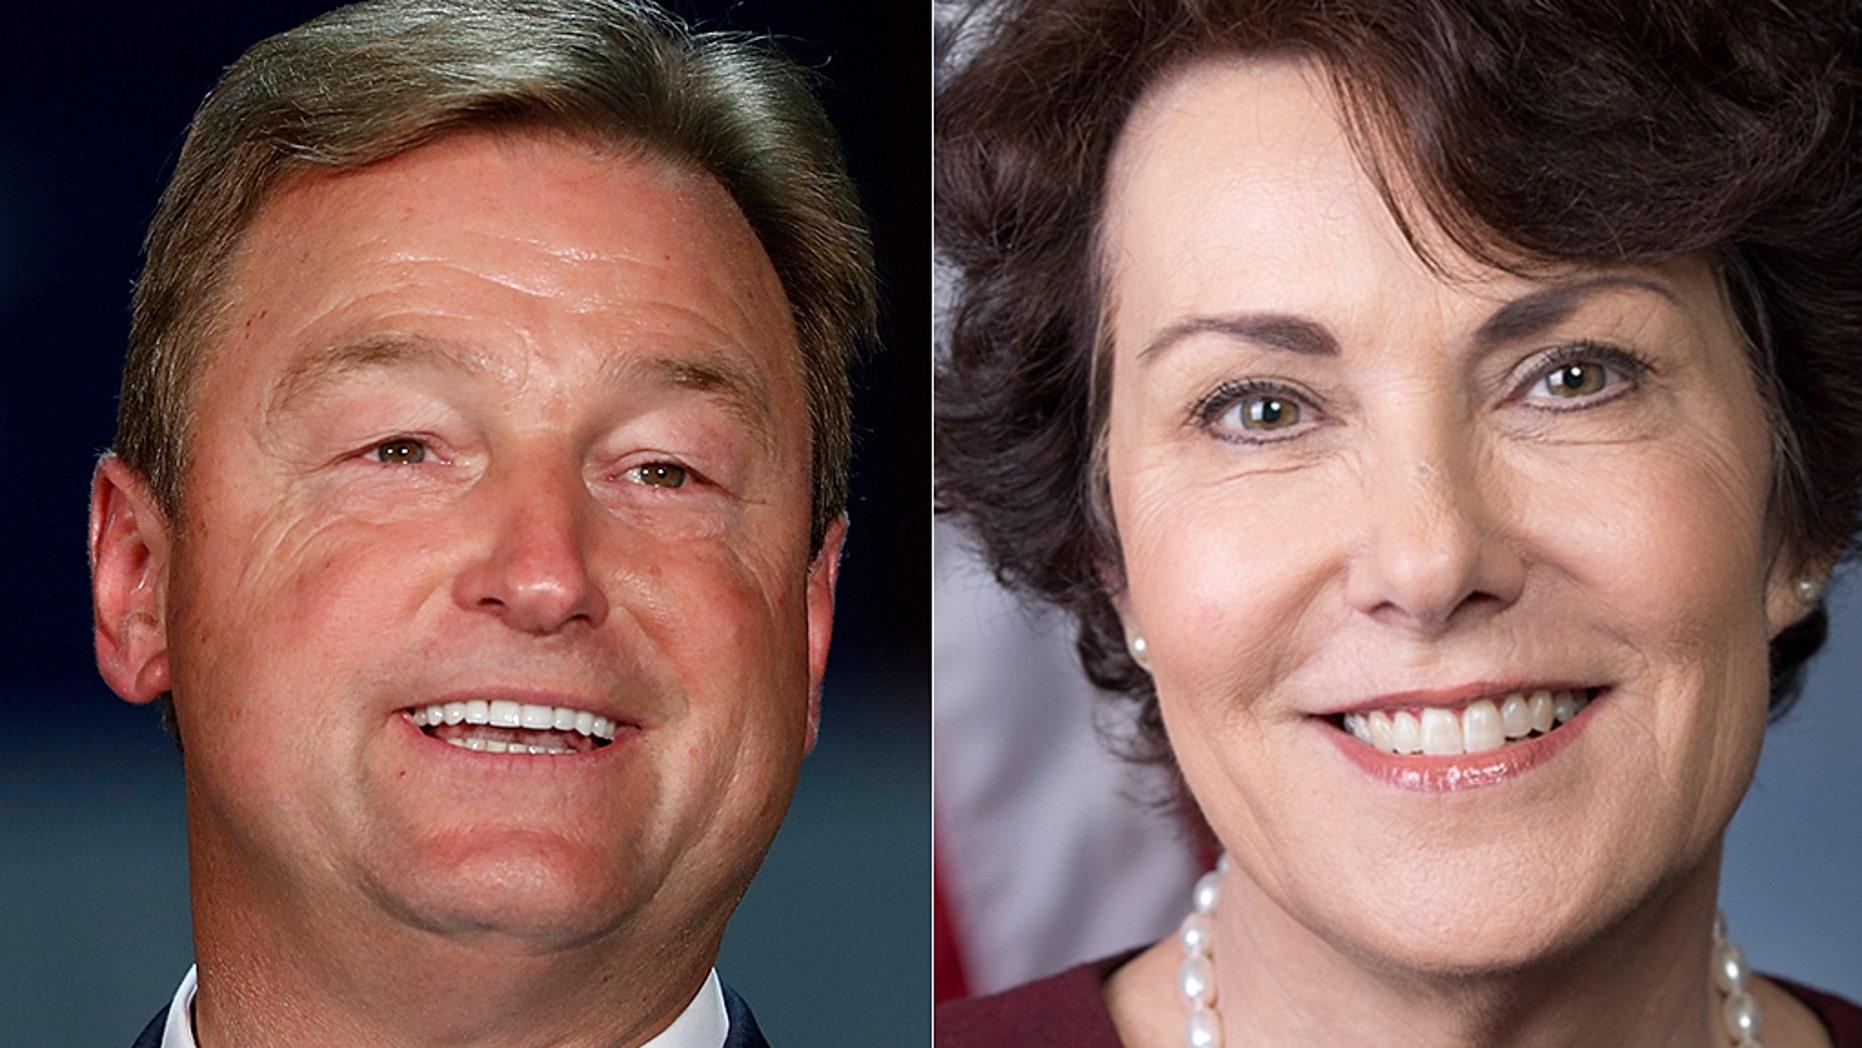 Incumbent Sen. Dean Heller is facing Democrat Rep. Jacky Rosen in a tight bid for re-election in Nevada.